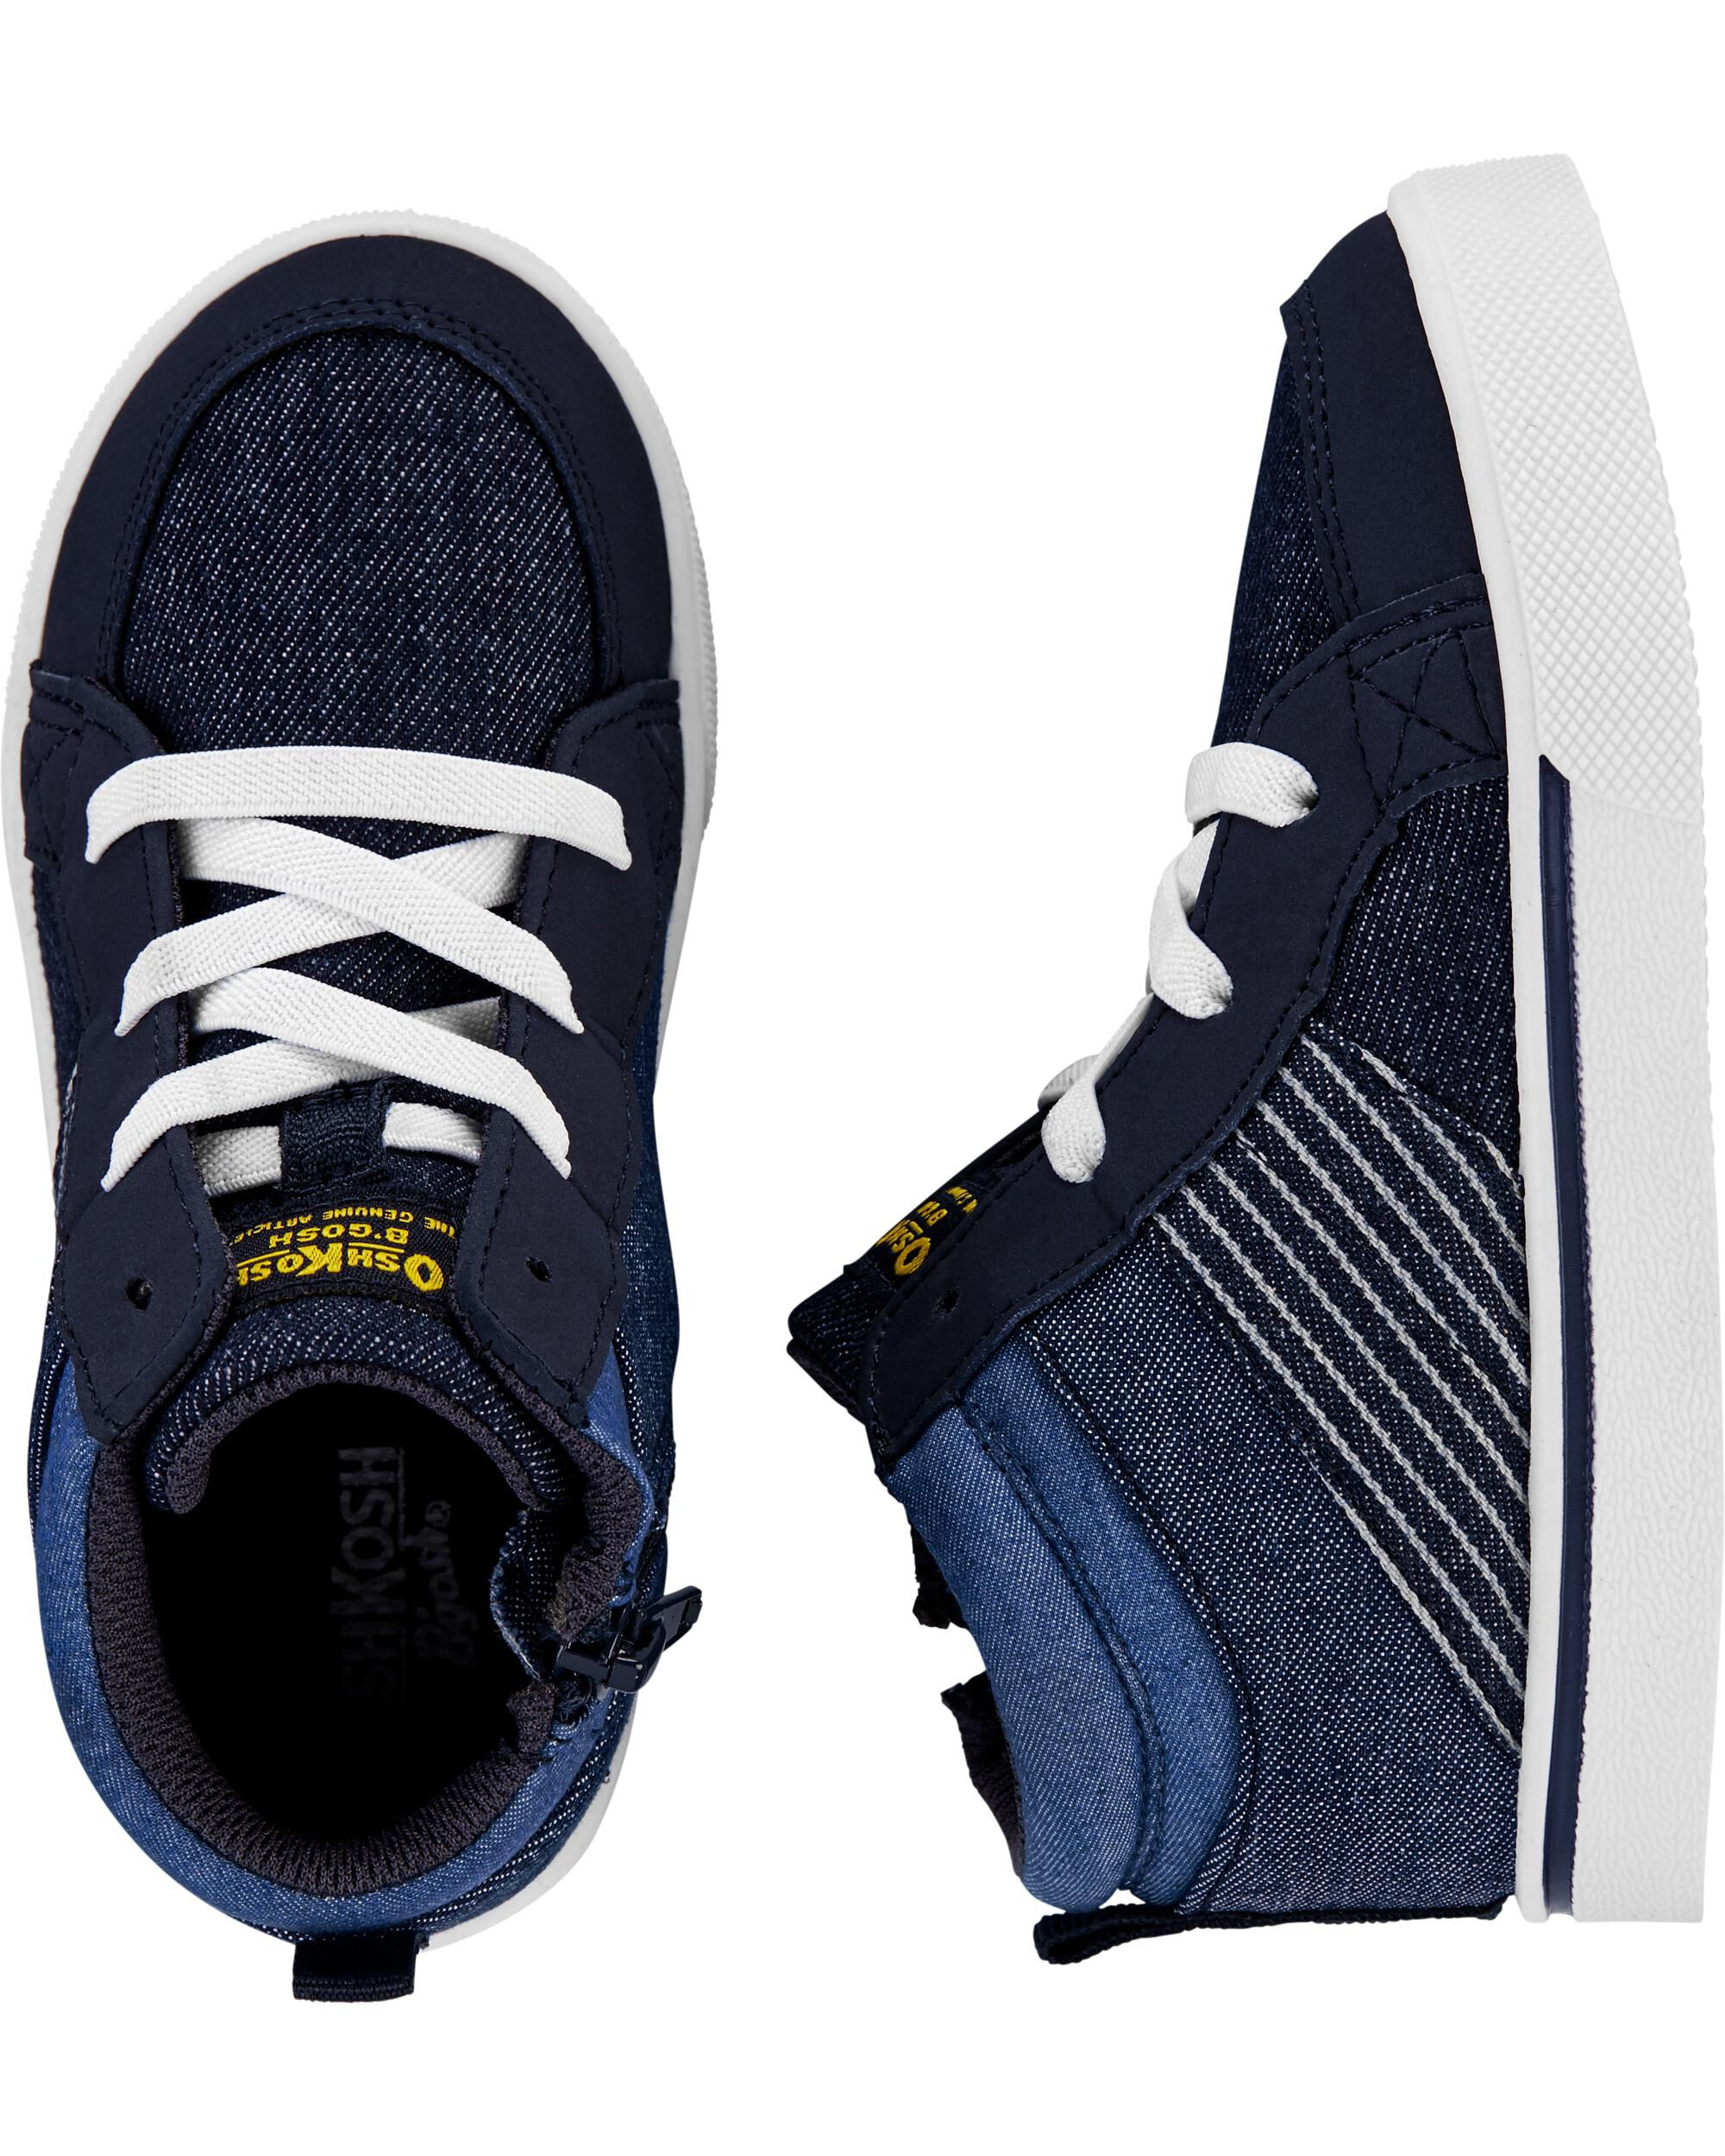 OshKosh Navy High-Top Sneakers